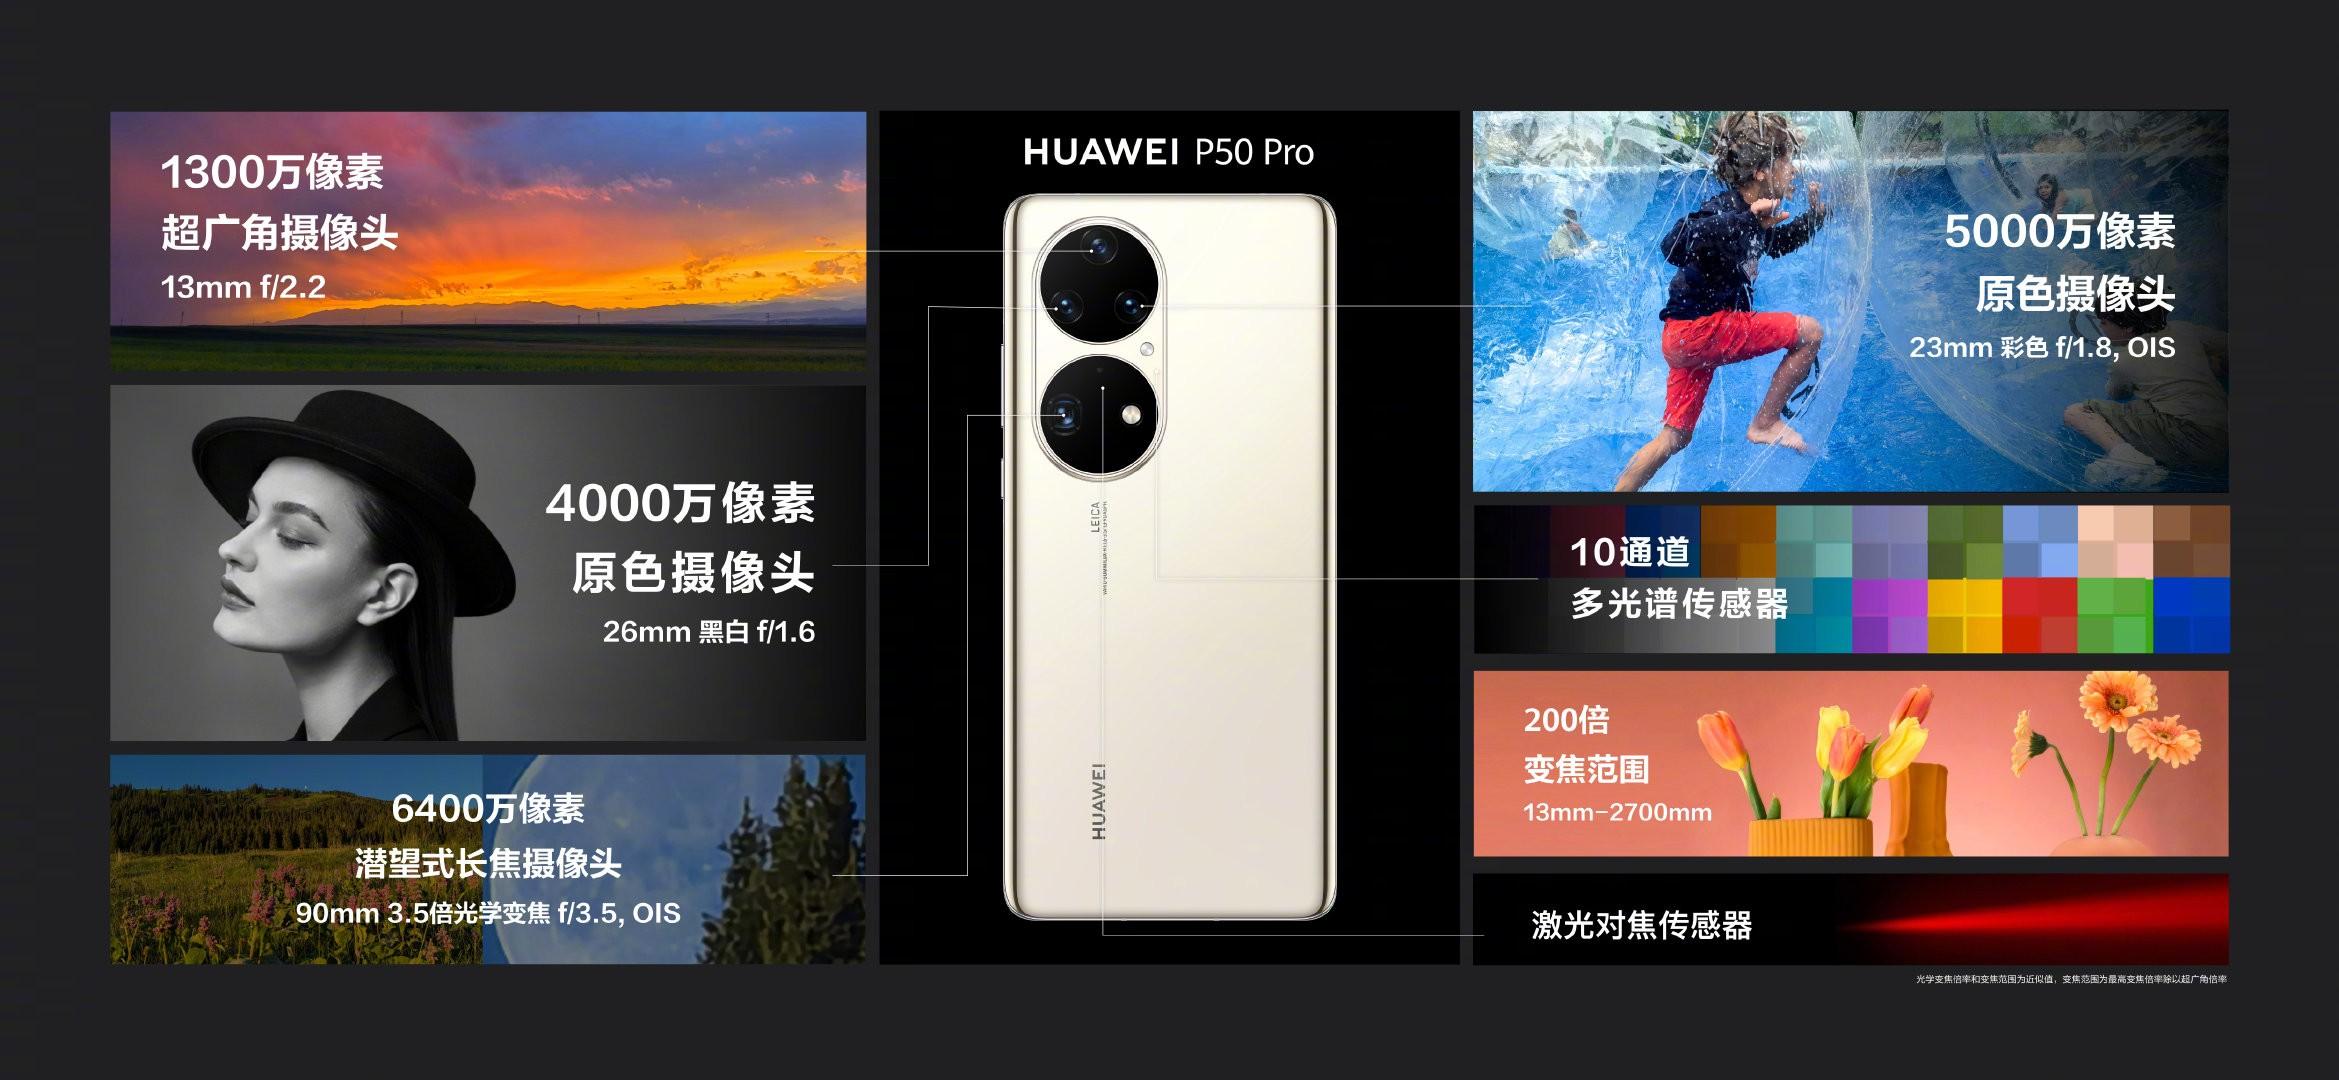 أبرز الاختلافات بين هواتف Huawei P50 وP50 Pro